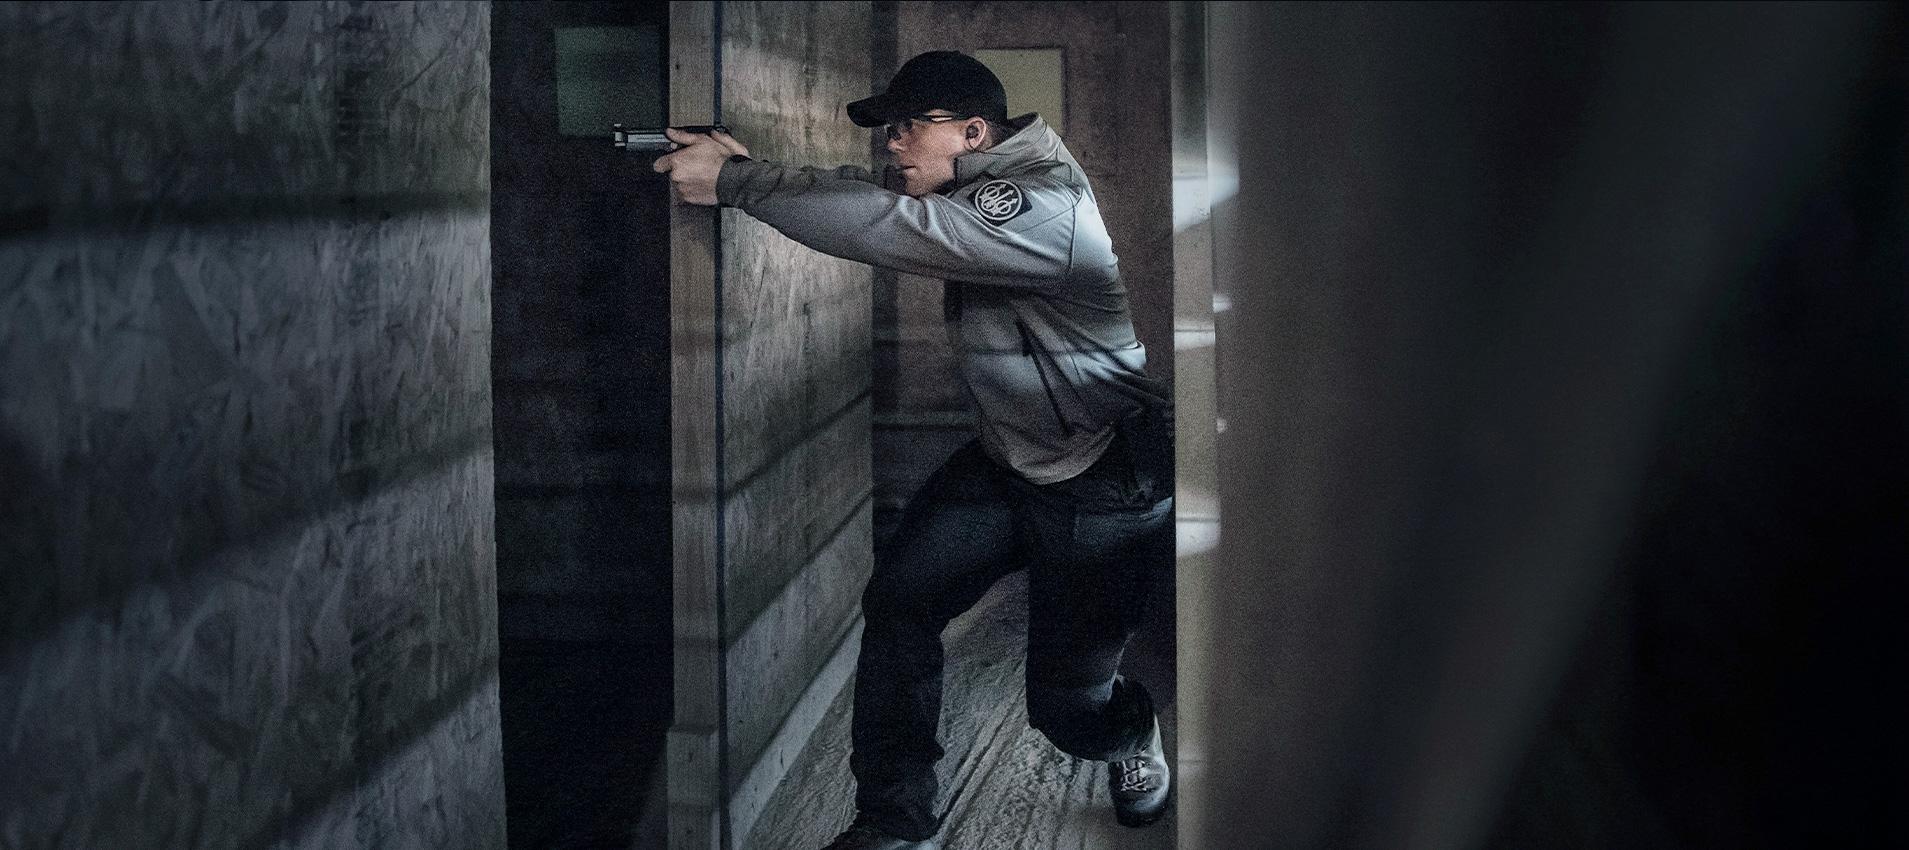 Beretta Tactical Gear